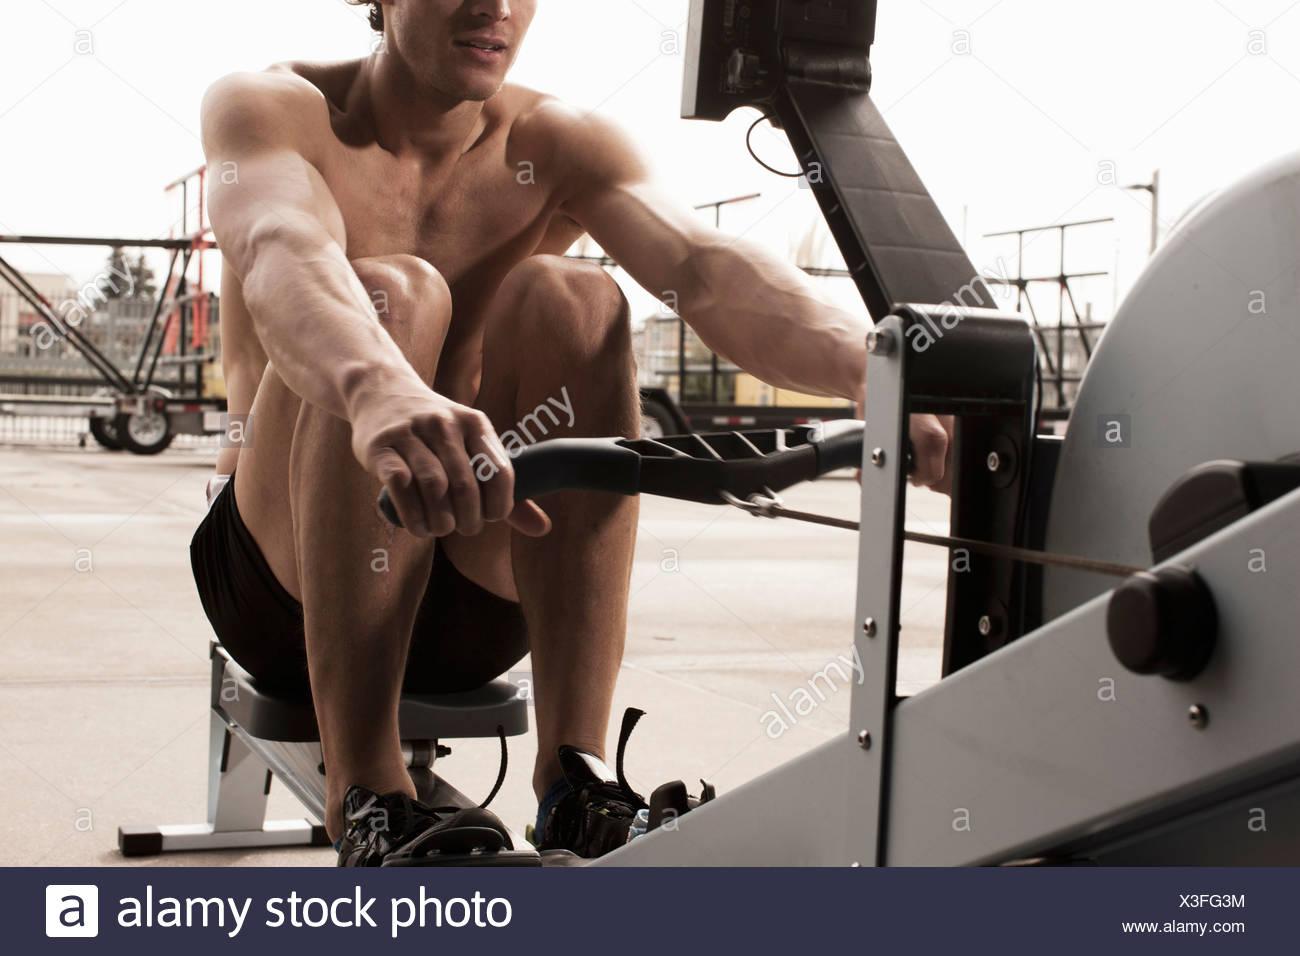 Mann mit Trainingsgeräten in Fitness-Studio Stockbild